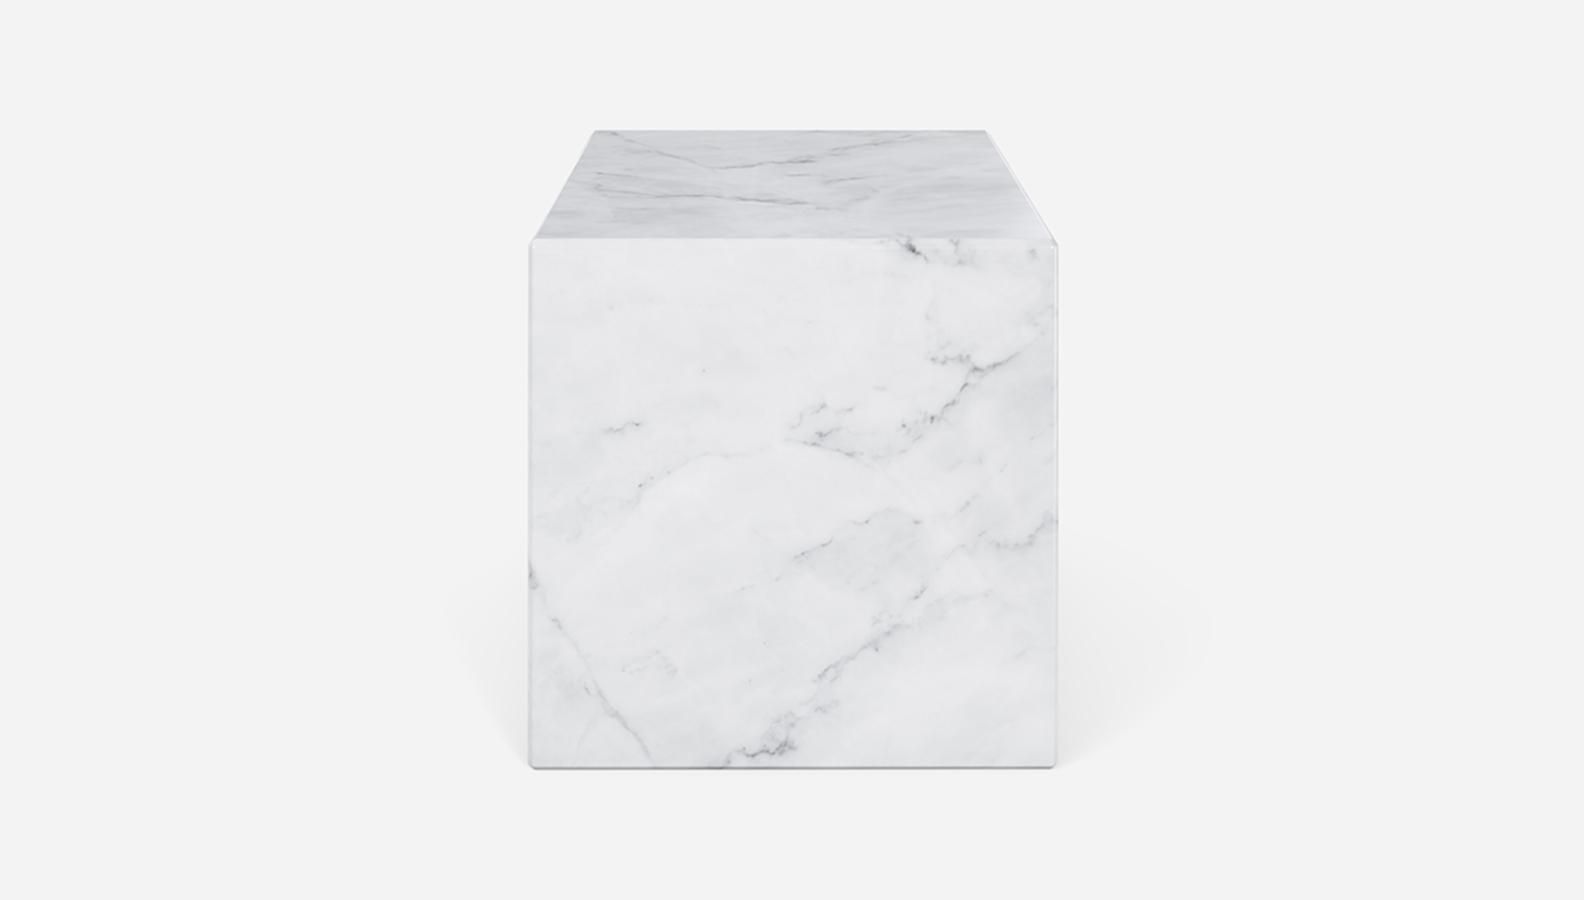 Aime Té Marmerblok Kubus - Carrara Wit - 40  x 40  x 40